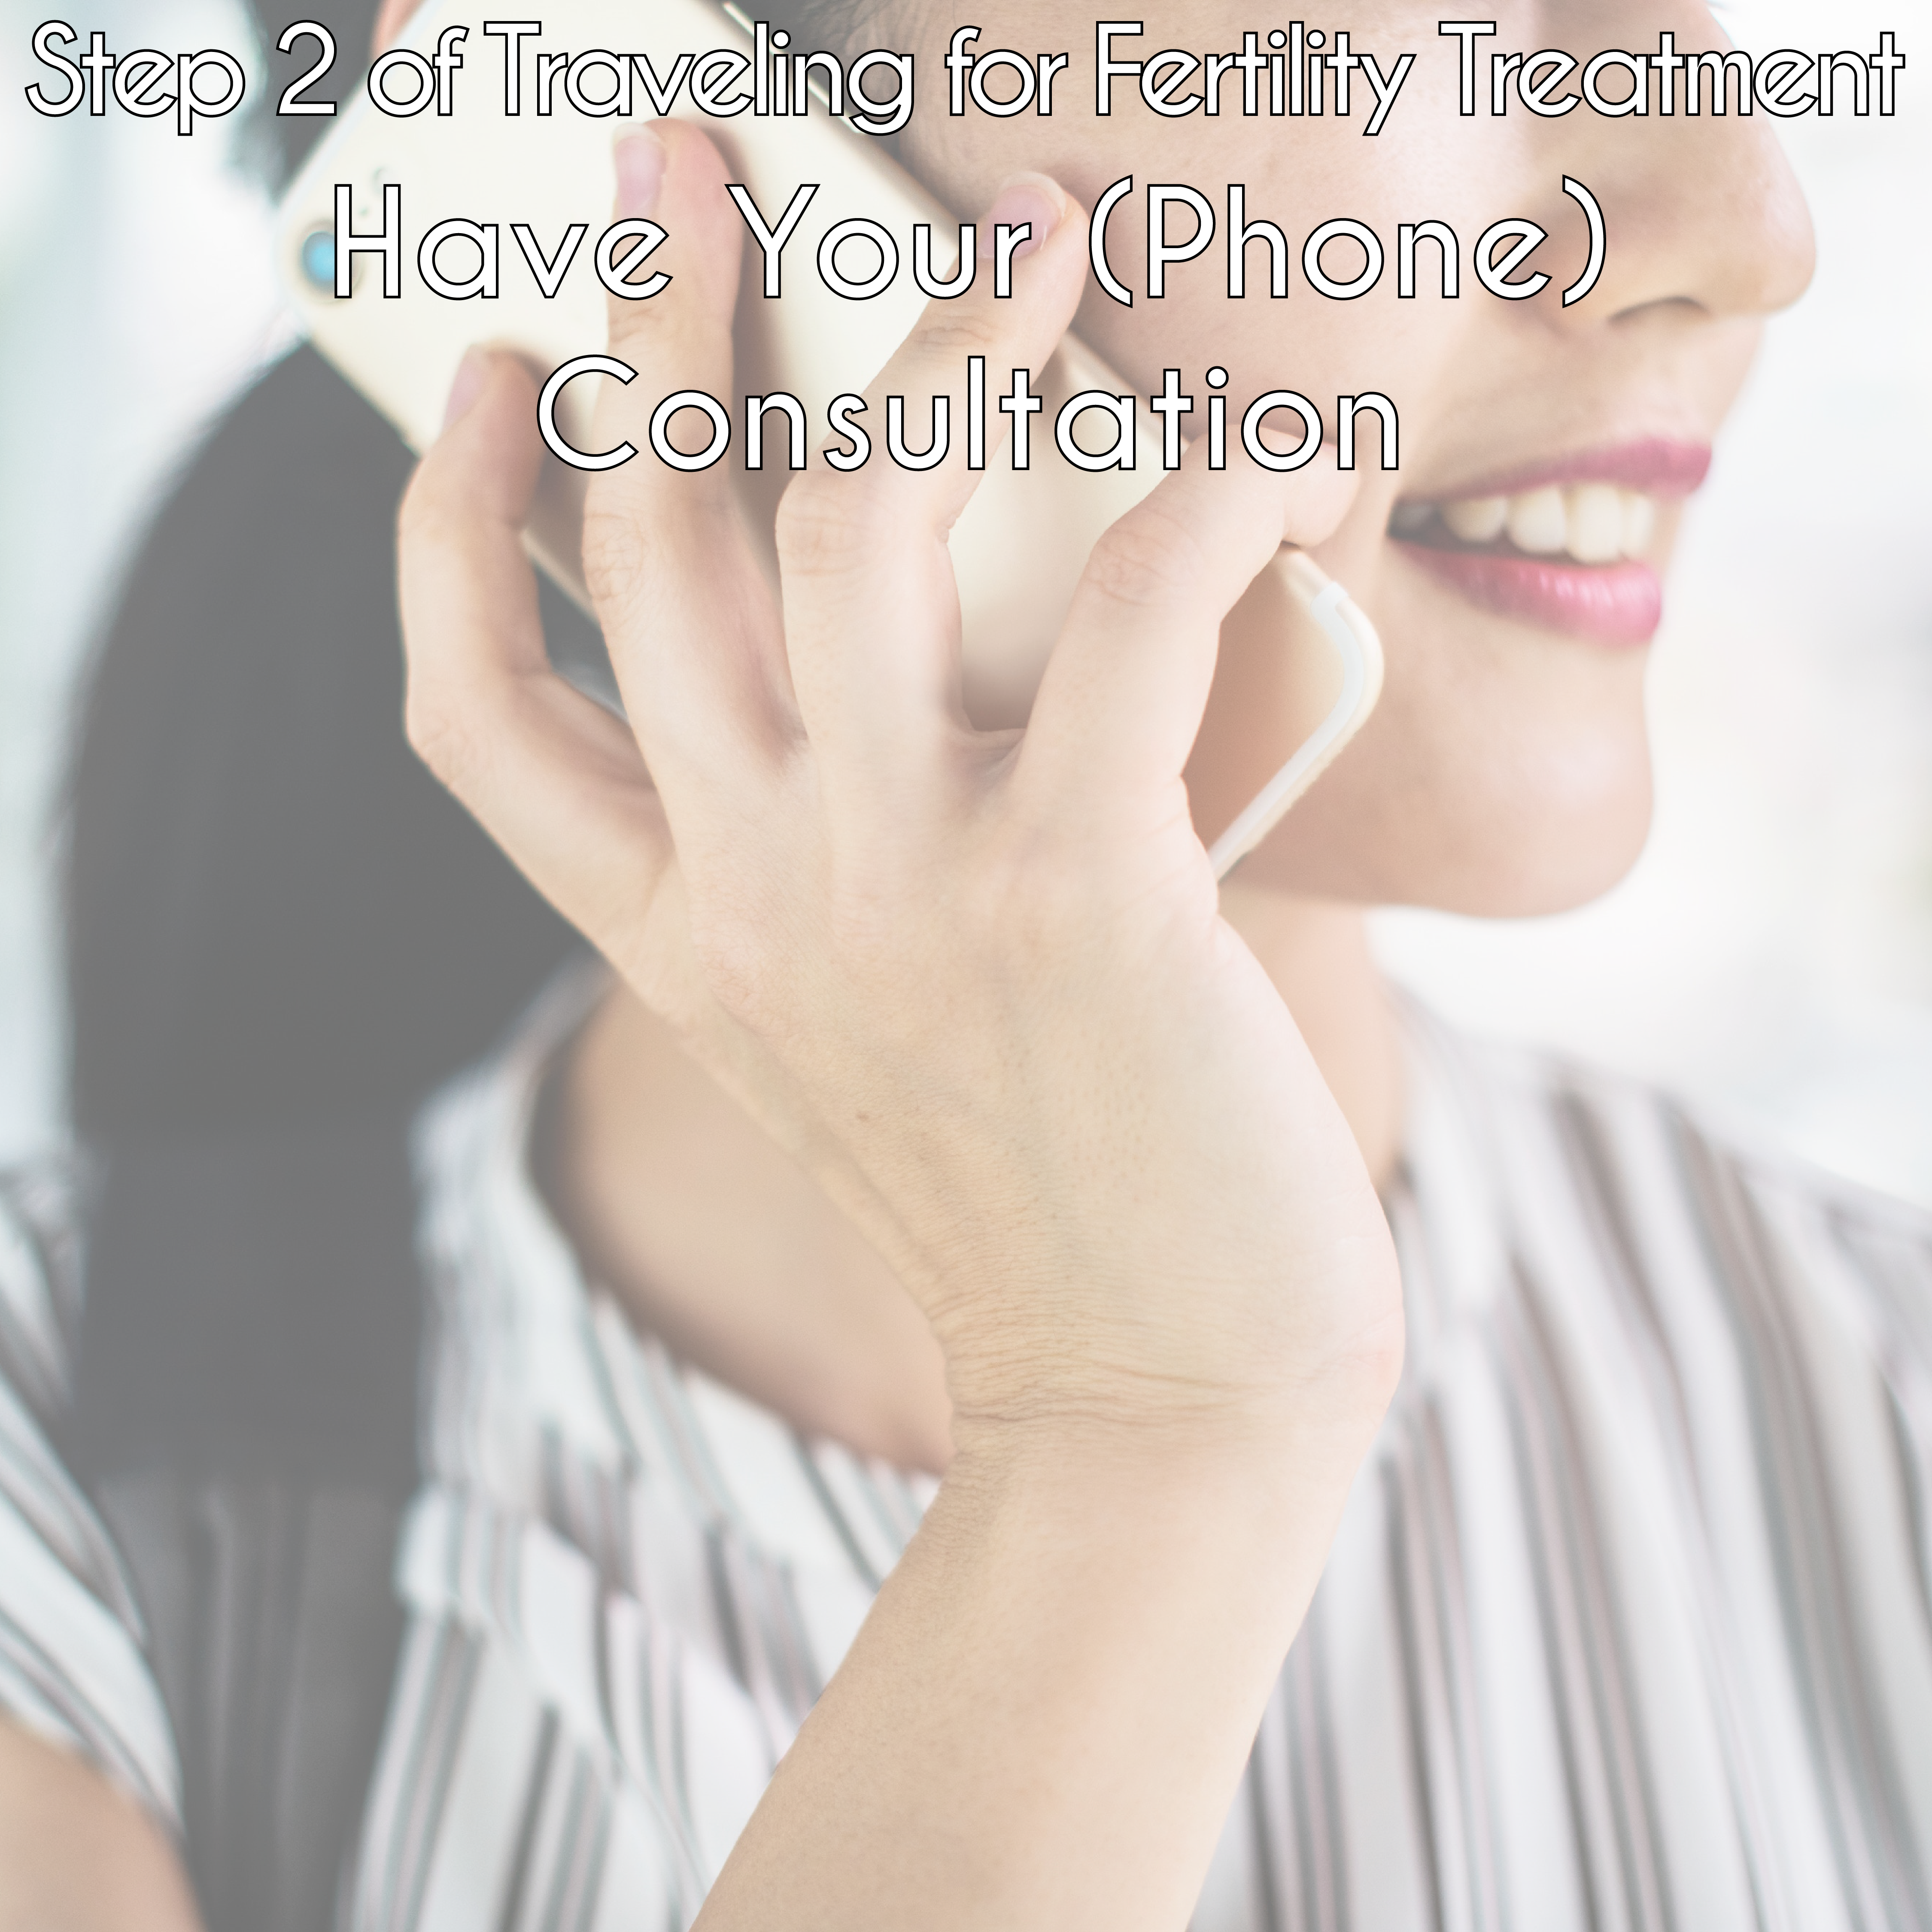 The Ten Steps of Traveling for Fertility   CNY Fertility Center